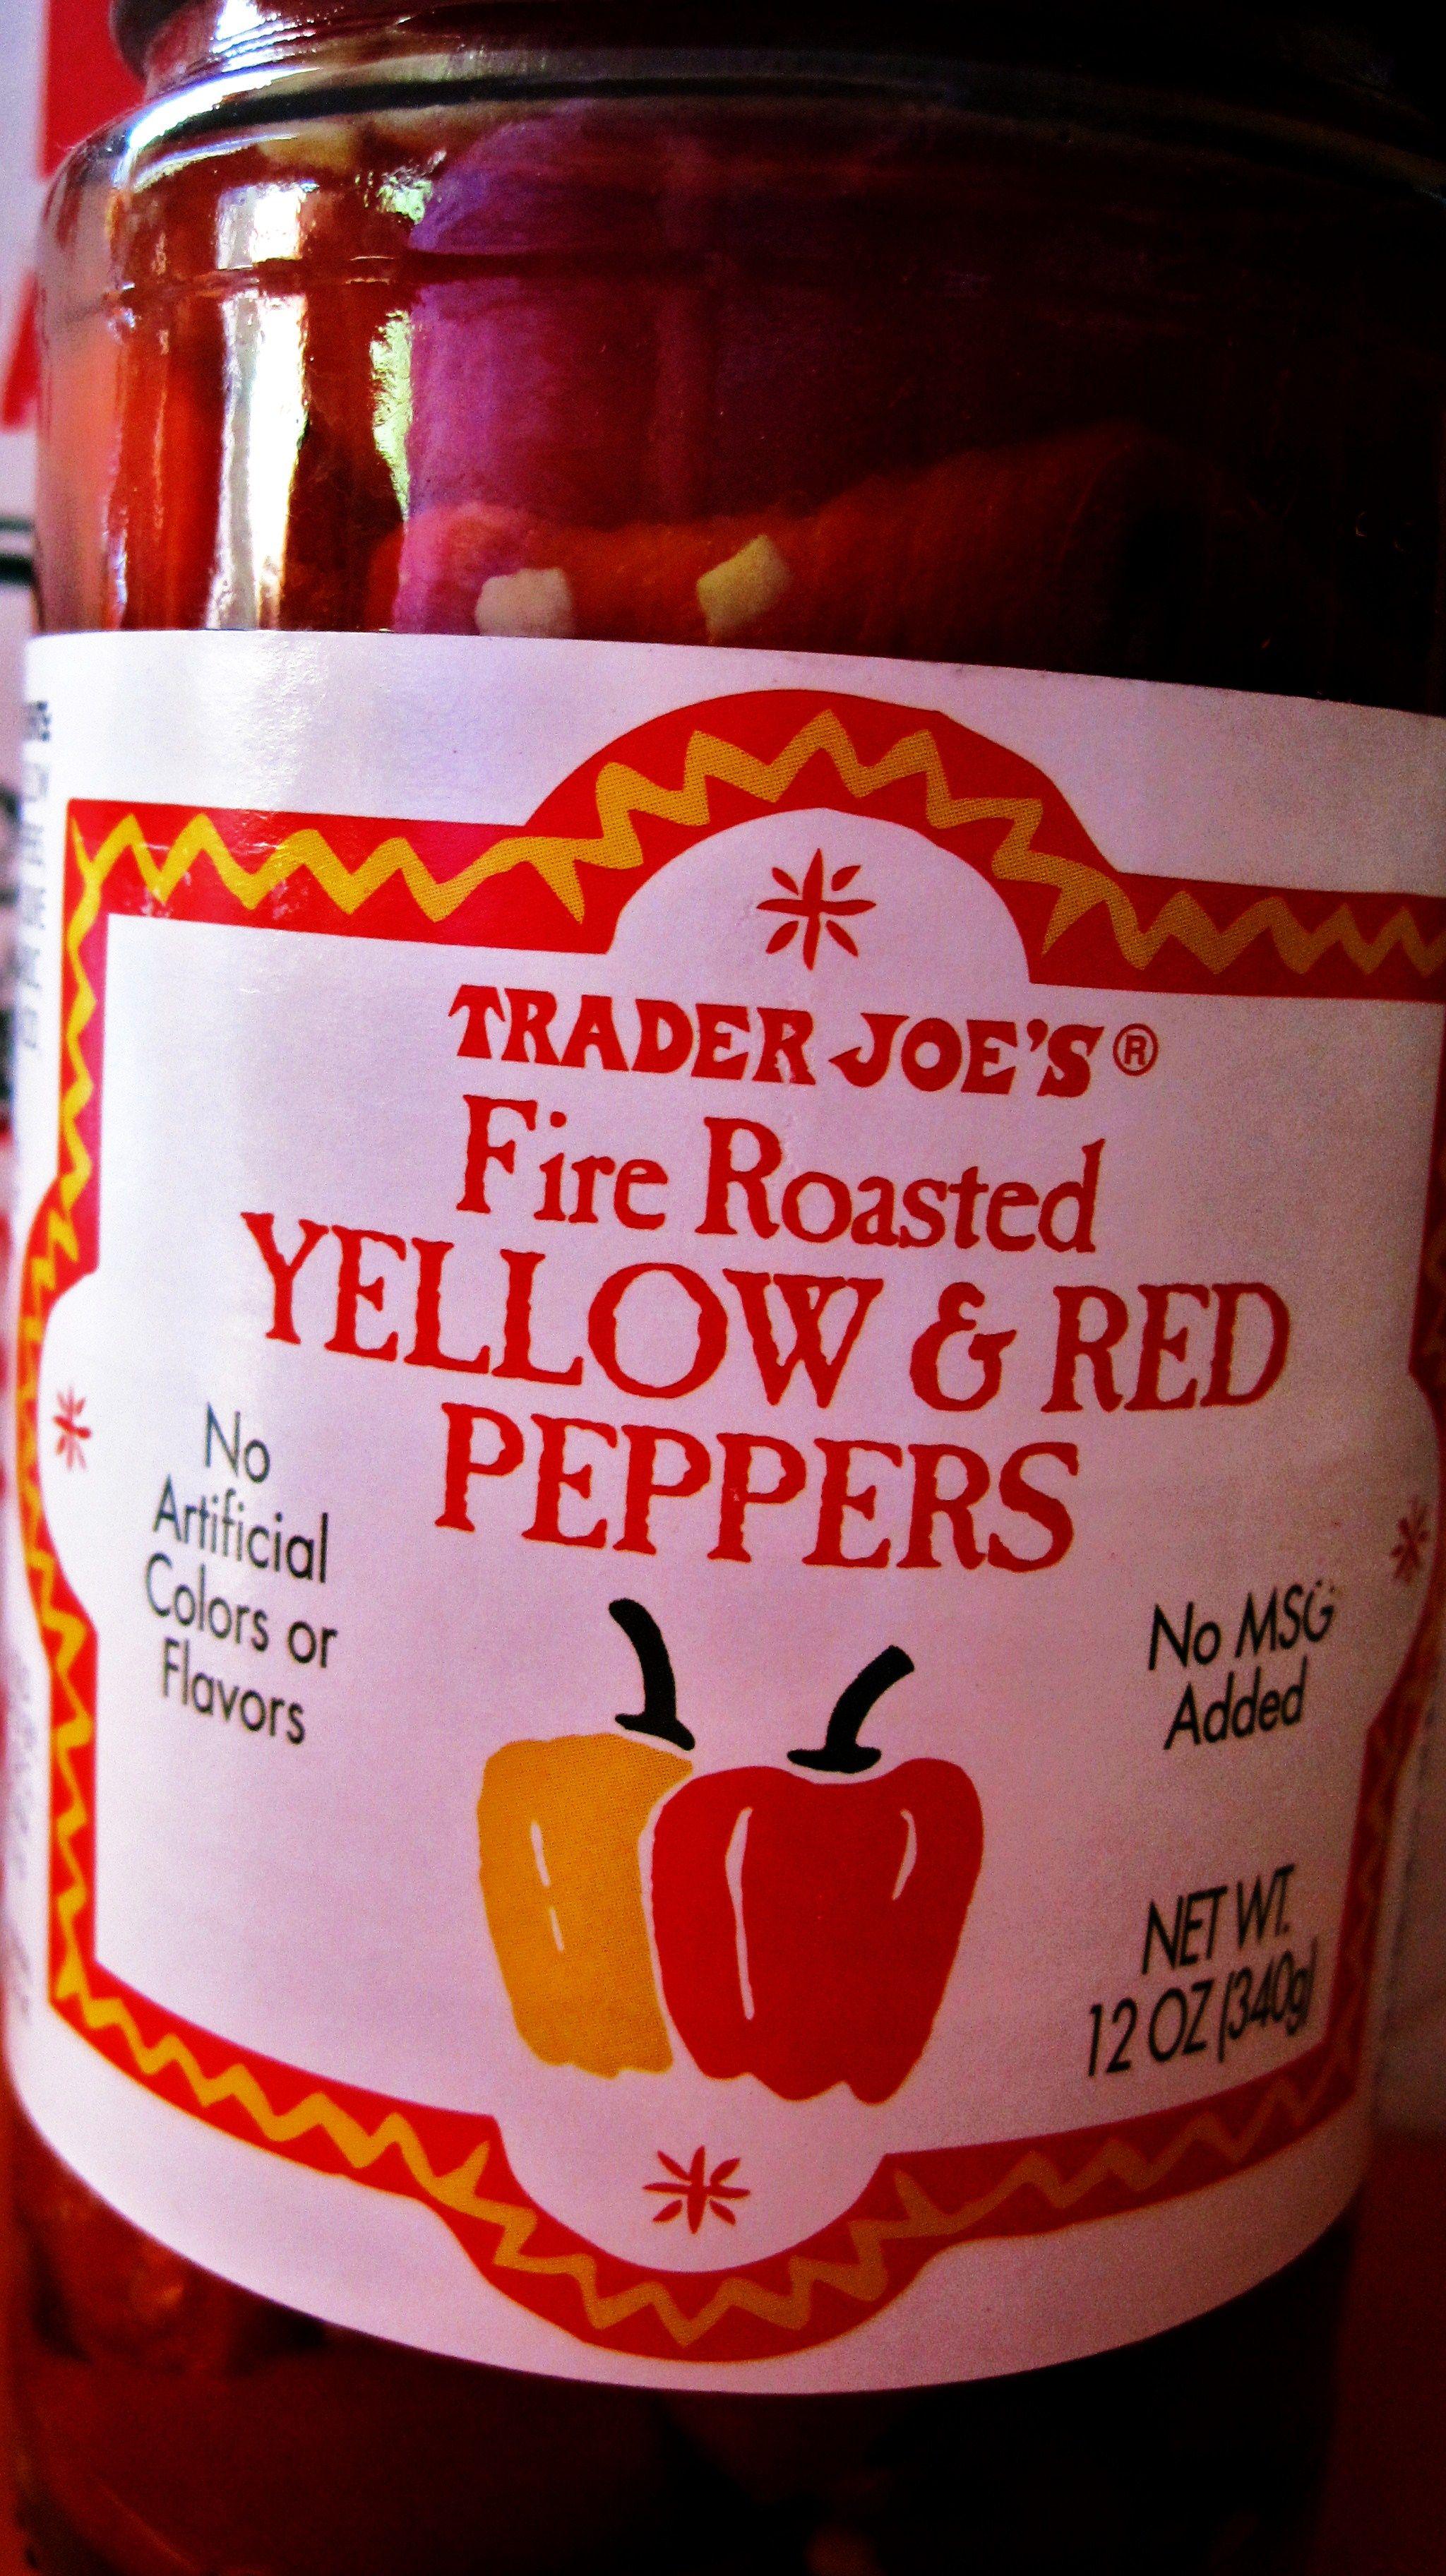 Trader Joe S Trader Joes Trader Joes Food Trader Joes Recipes